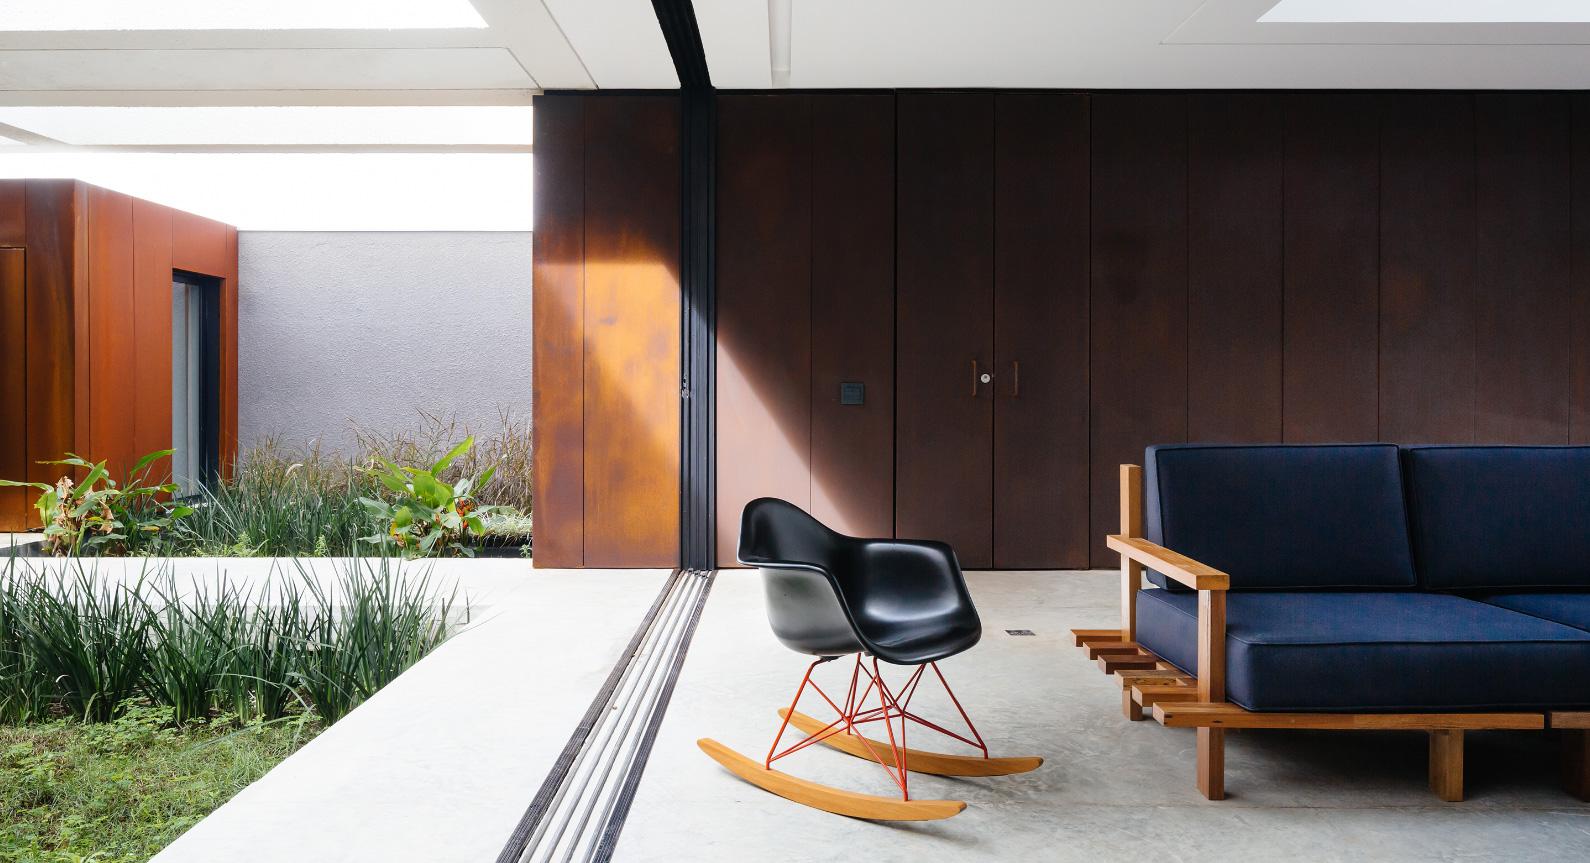 How Rusting Steel And White Concrete Create Aleph Zero's Stunning Brazilian Seaside Home